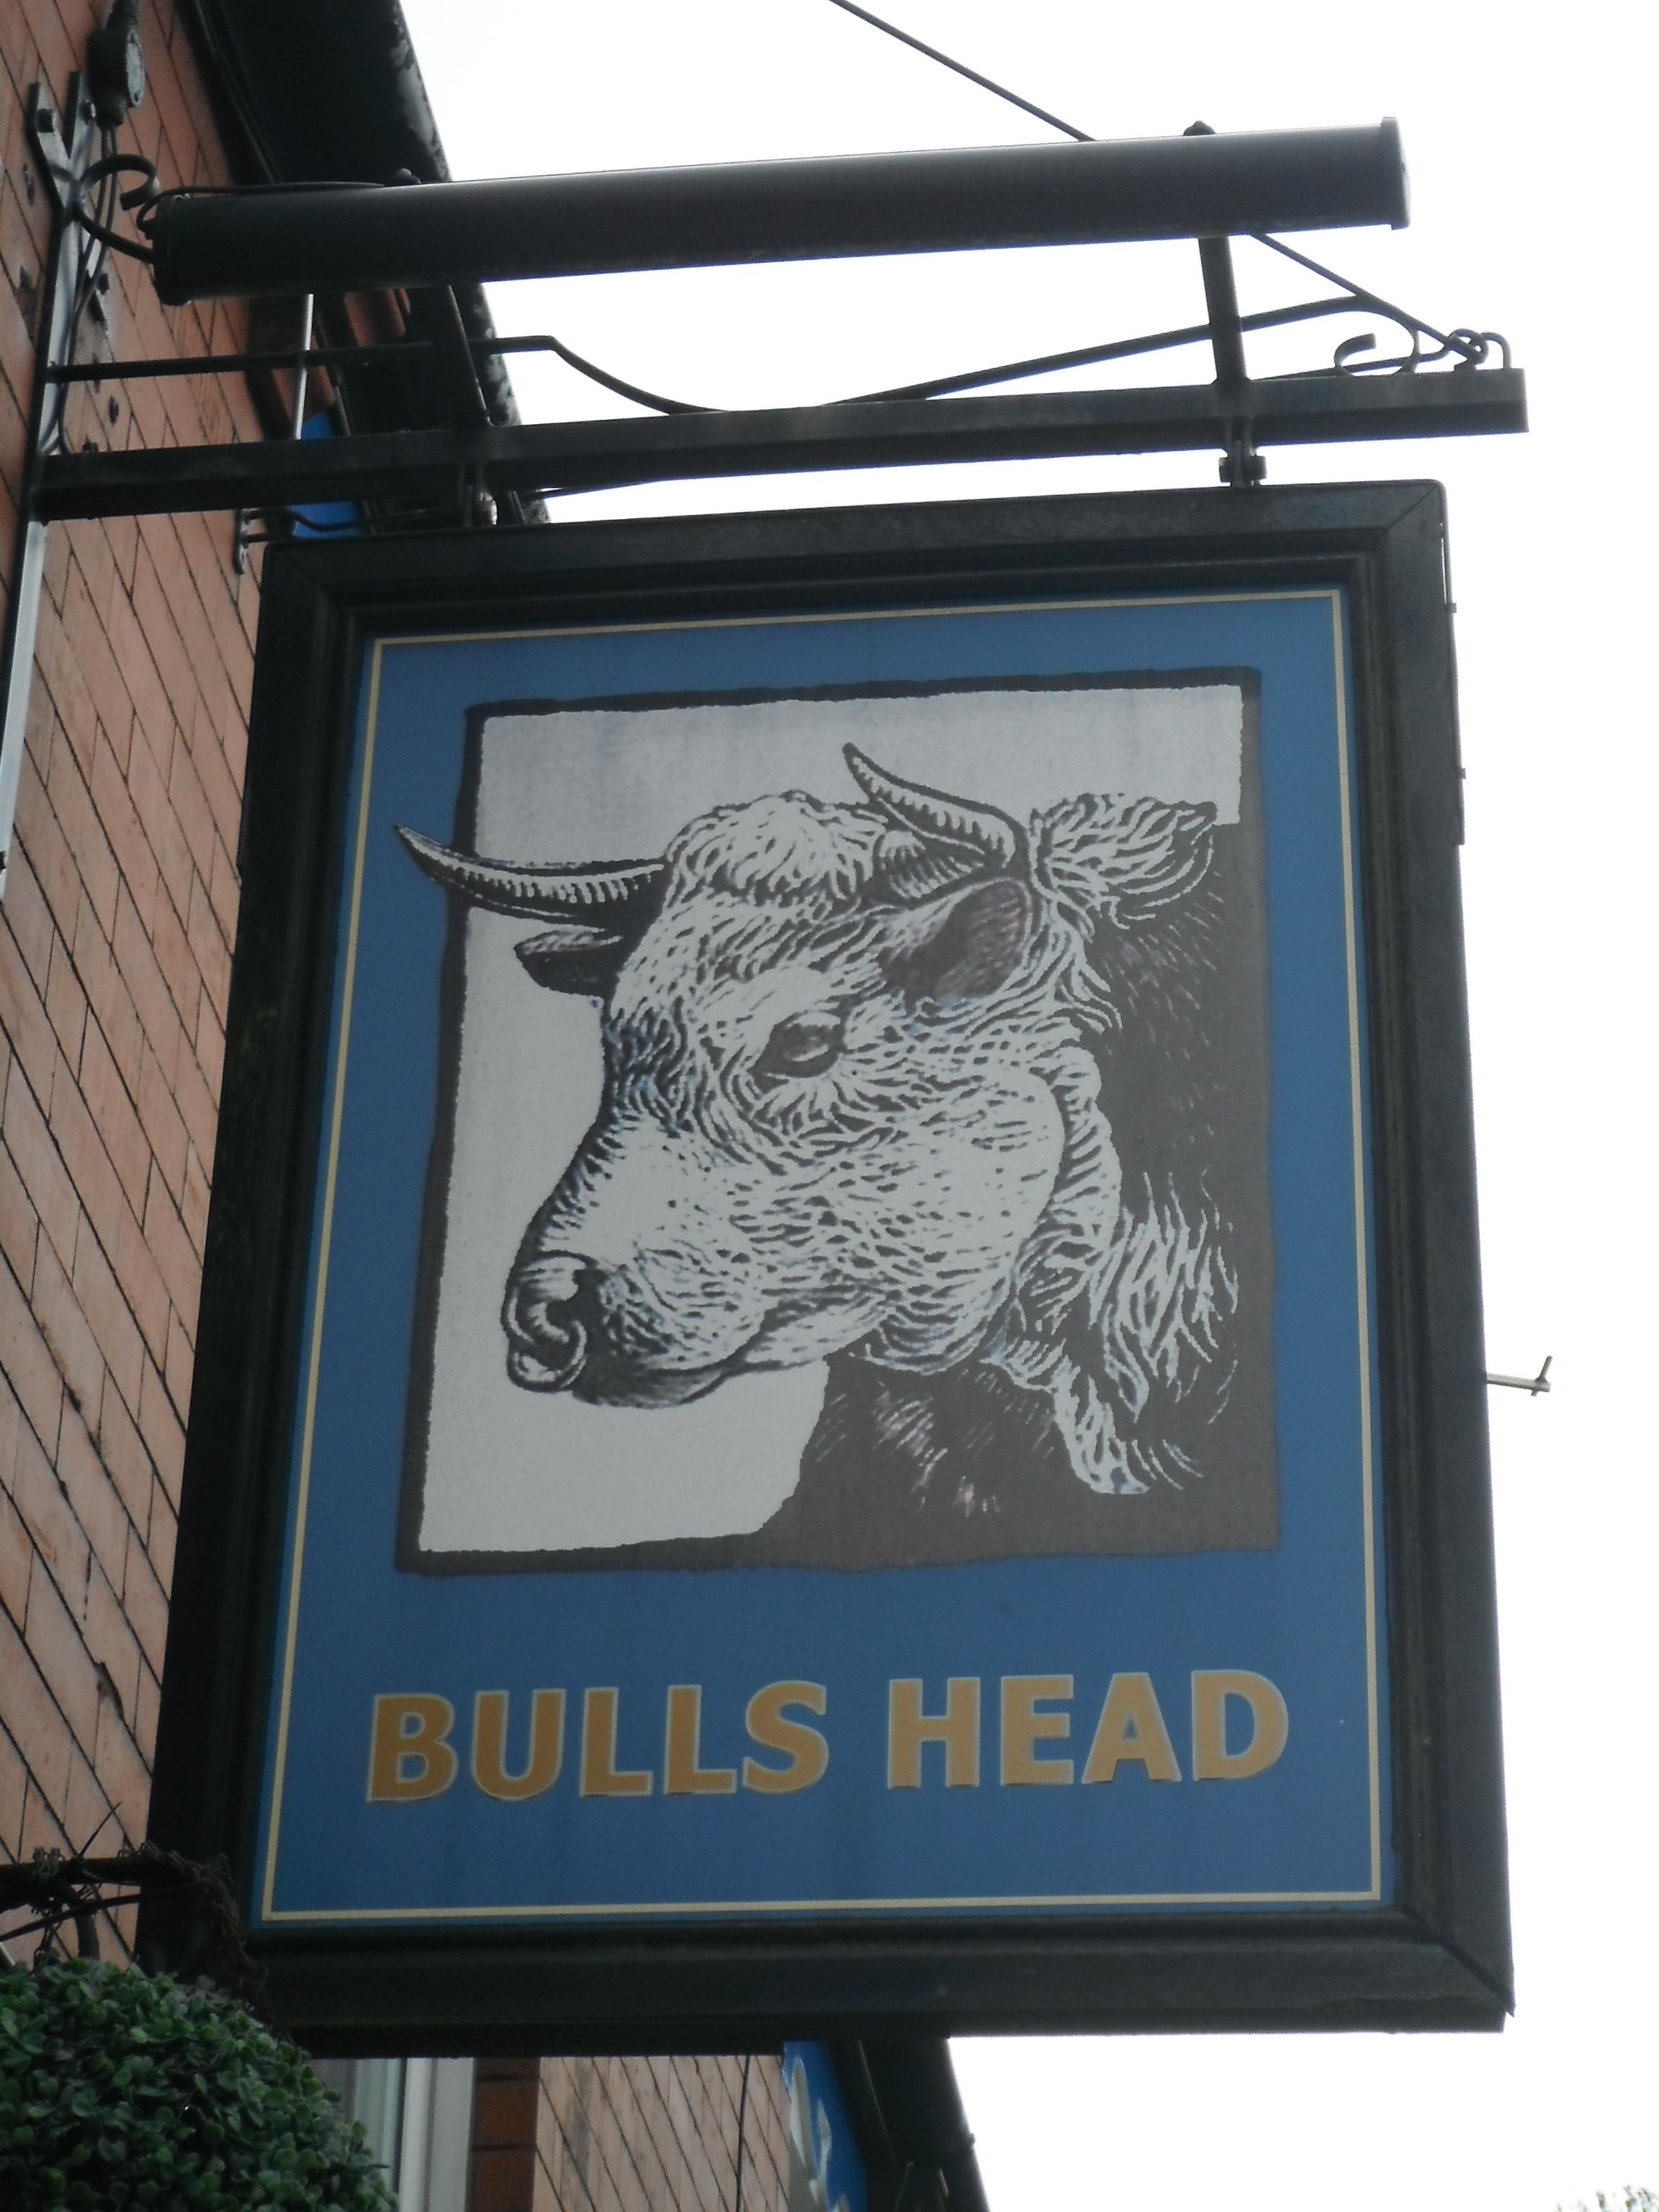 Photo taken by me – The Bulls Head Inn Sign – Oldham